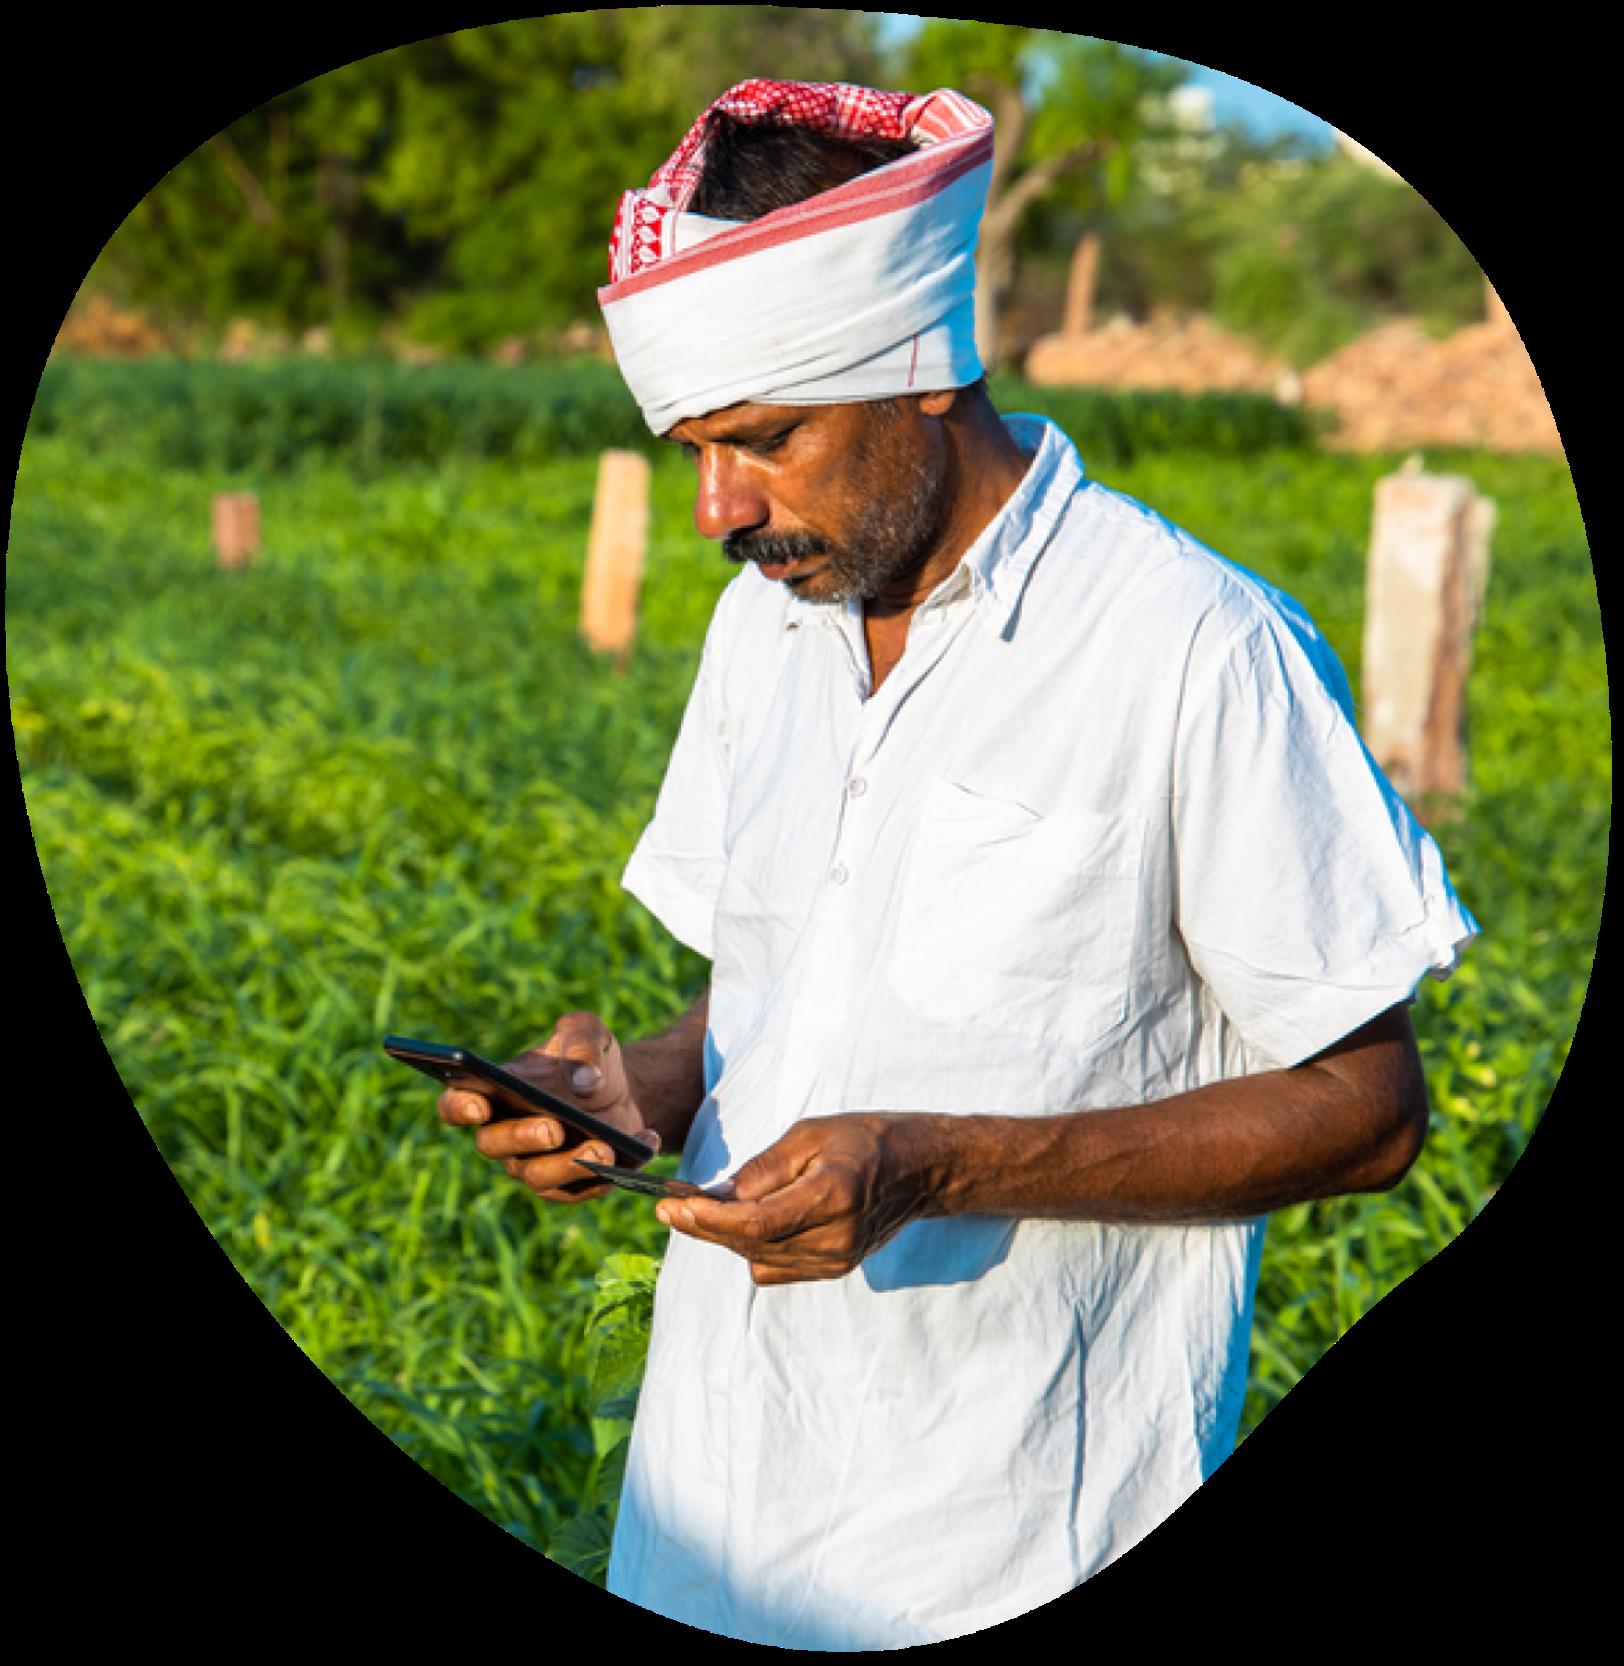 Farmer looking at phone